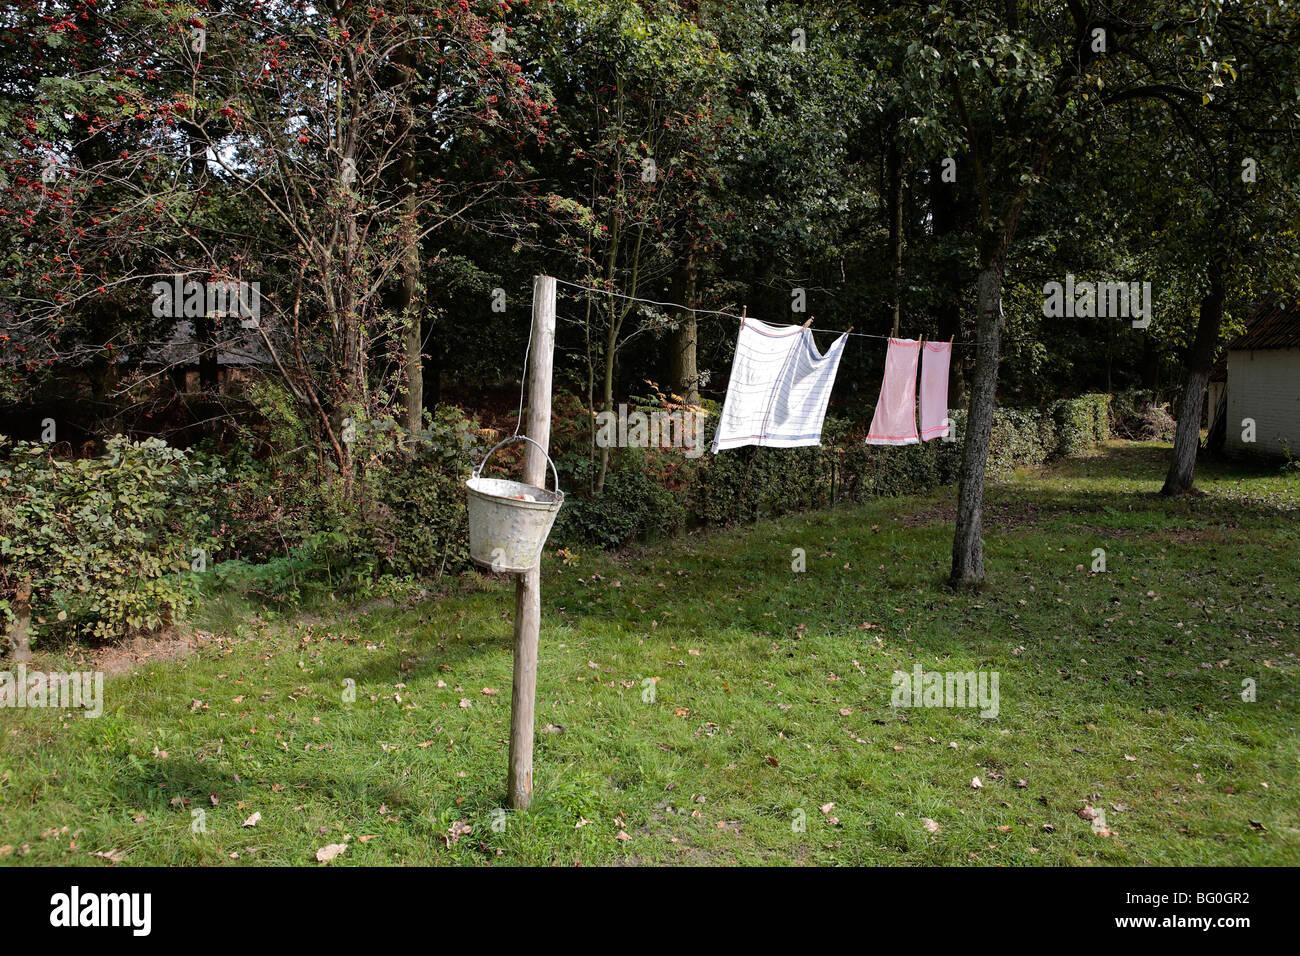 drying laundry on outside clothesline - Stock Image